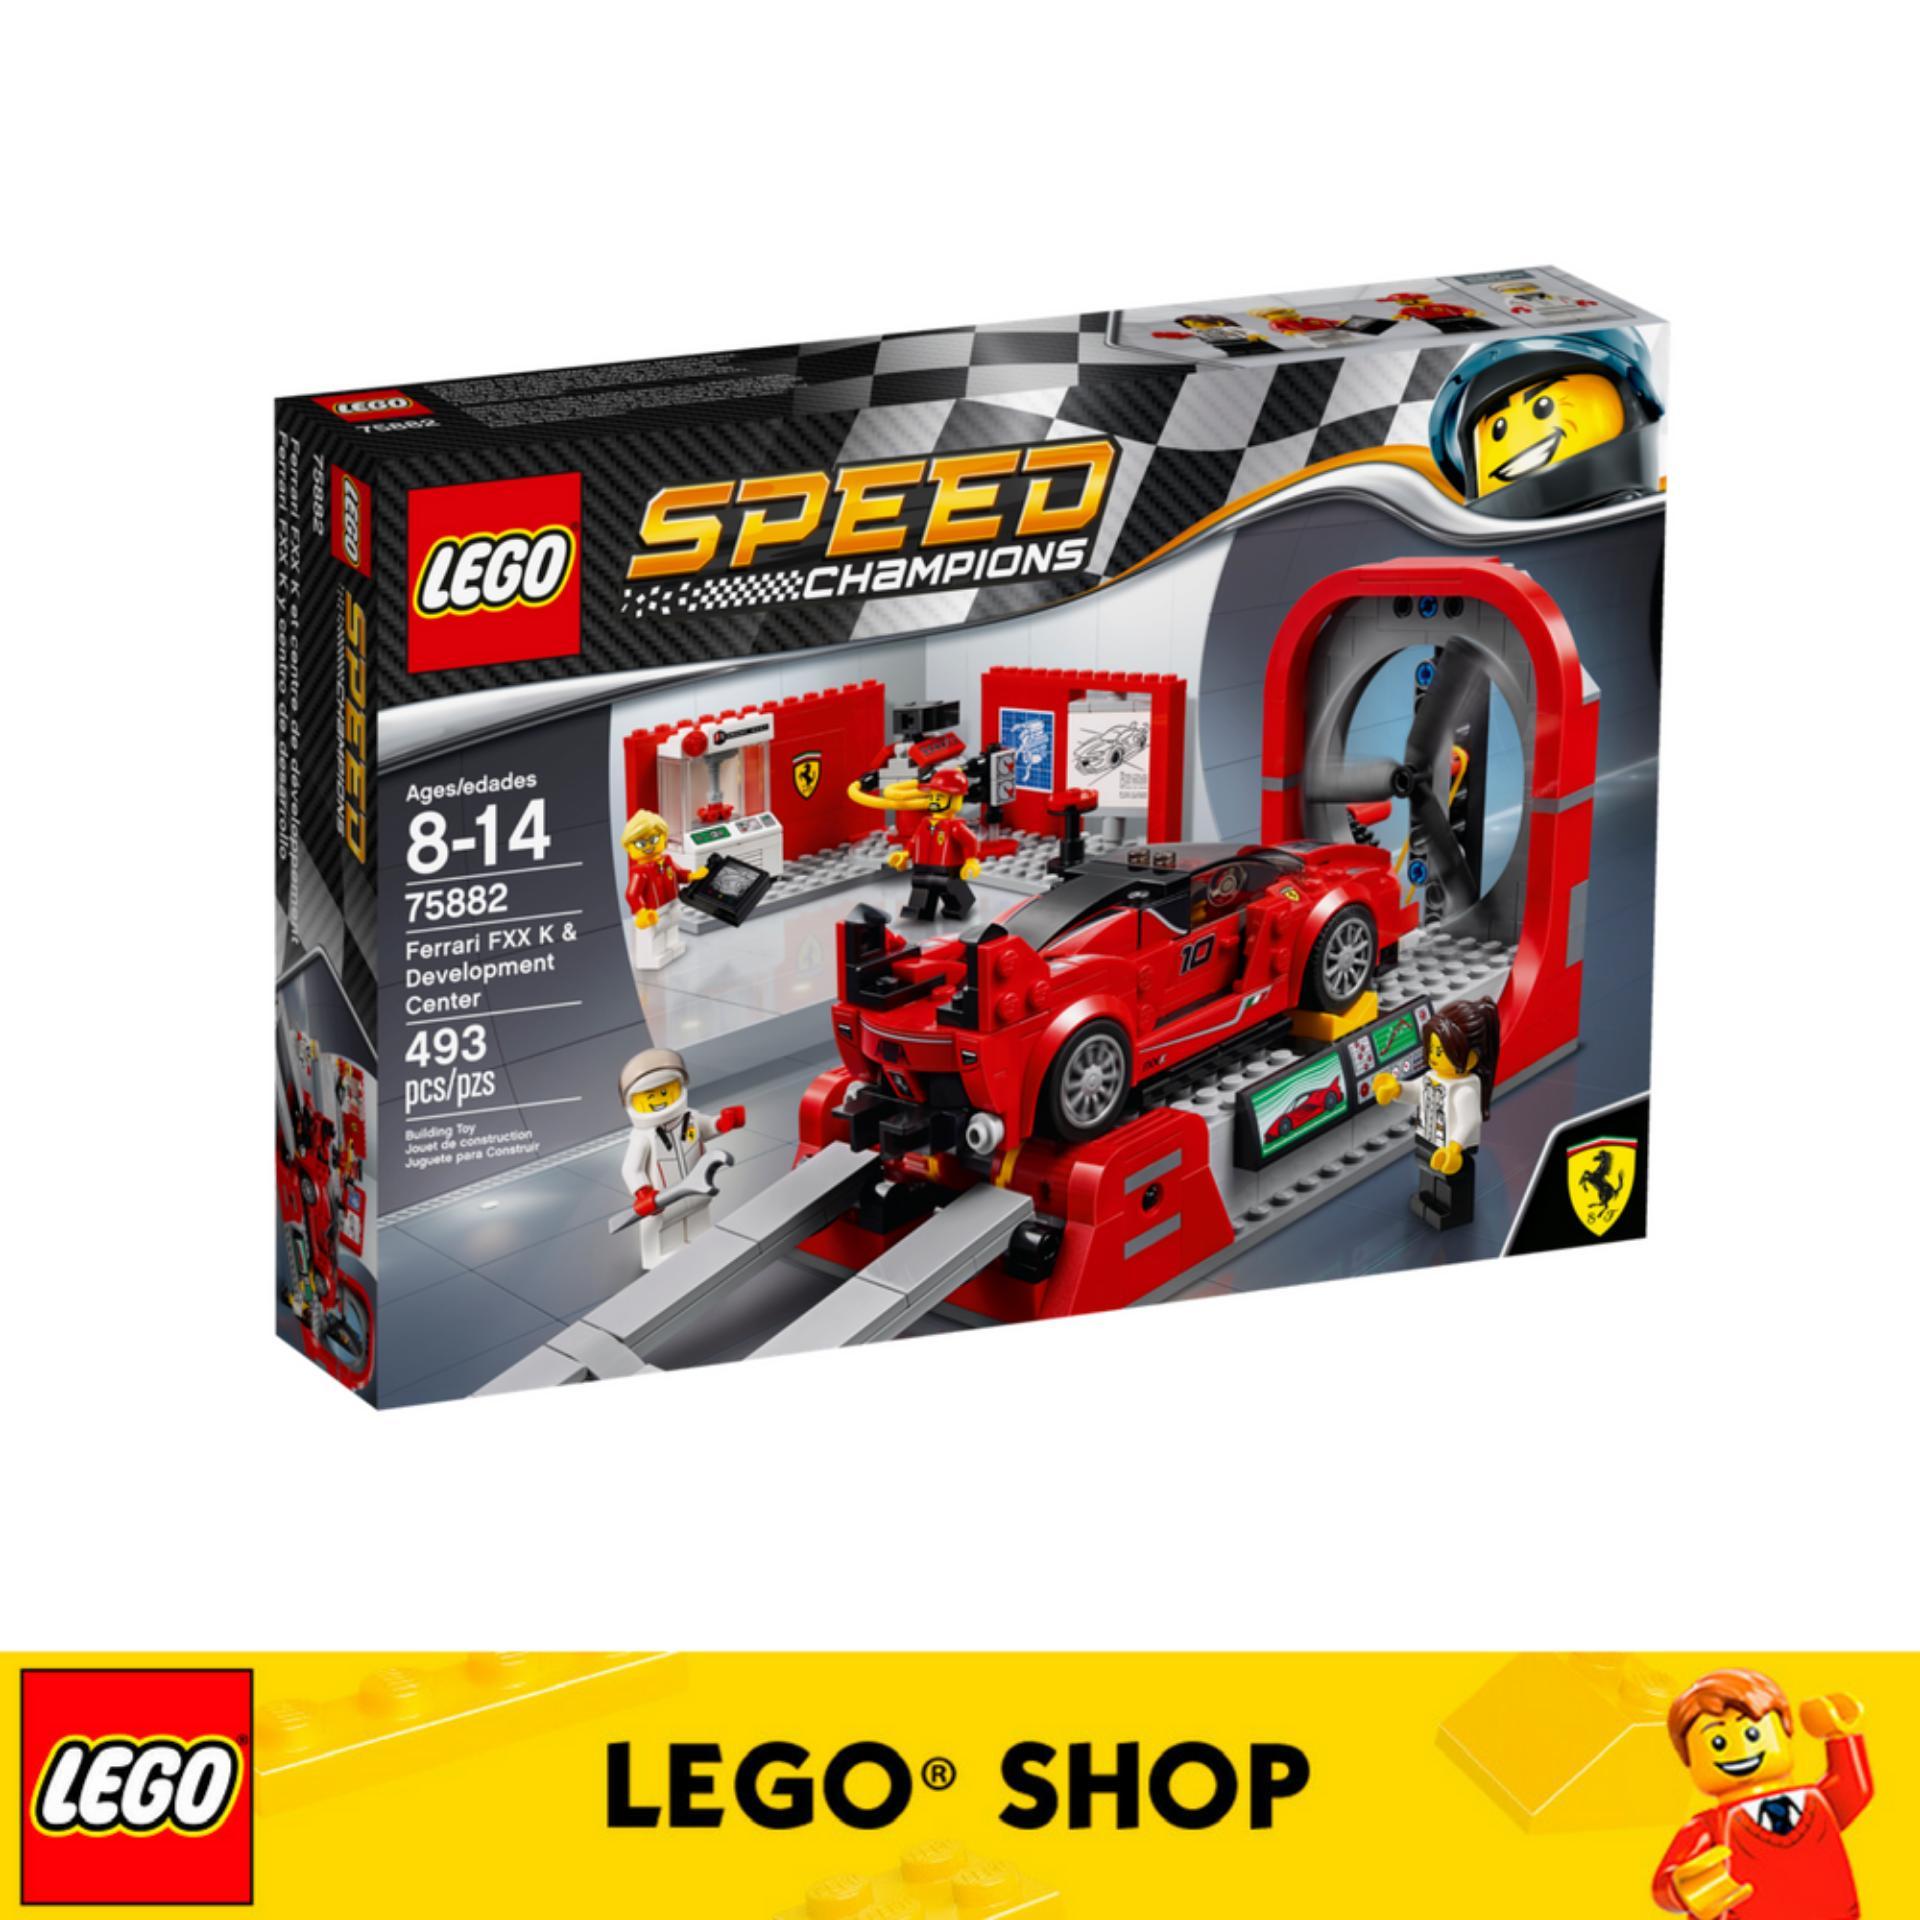 Buying Lego® Speed Champions Ferrari Fxx K Development Center 75882